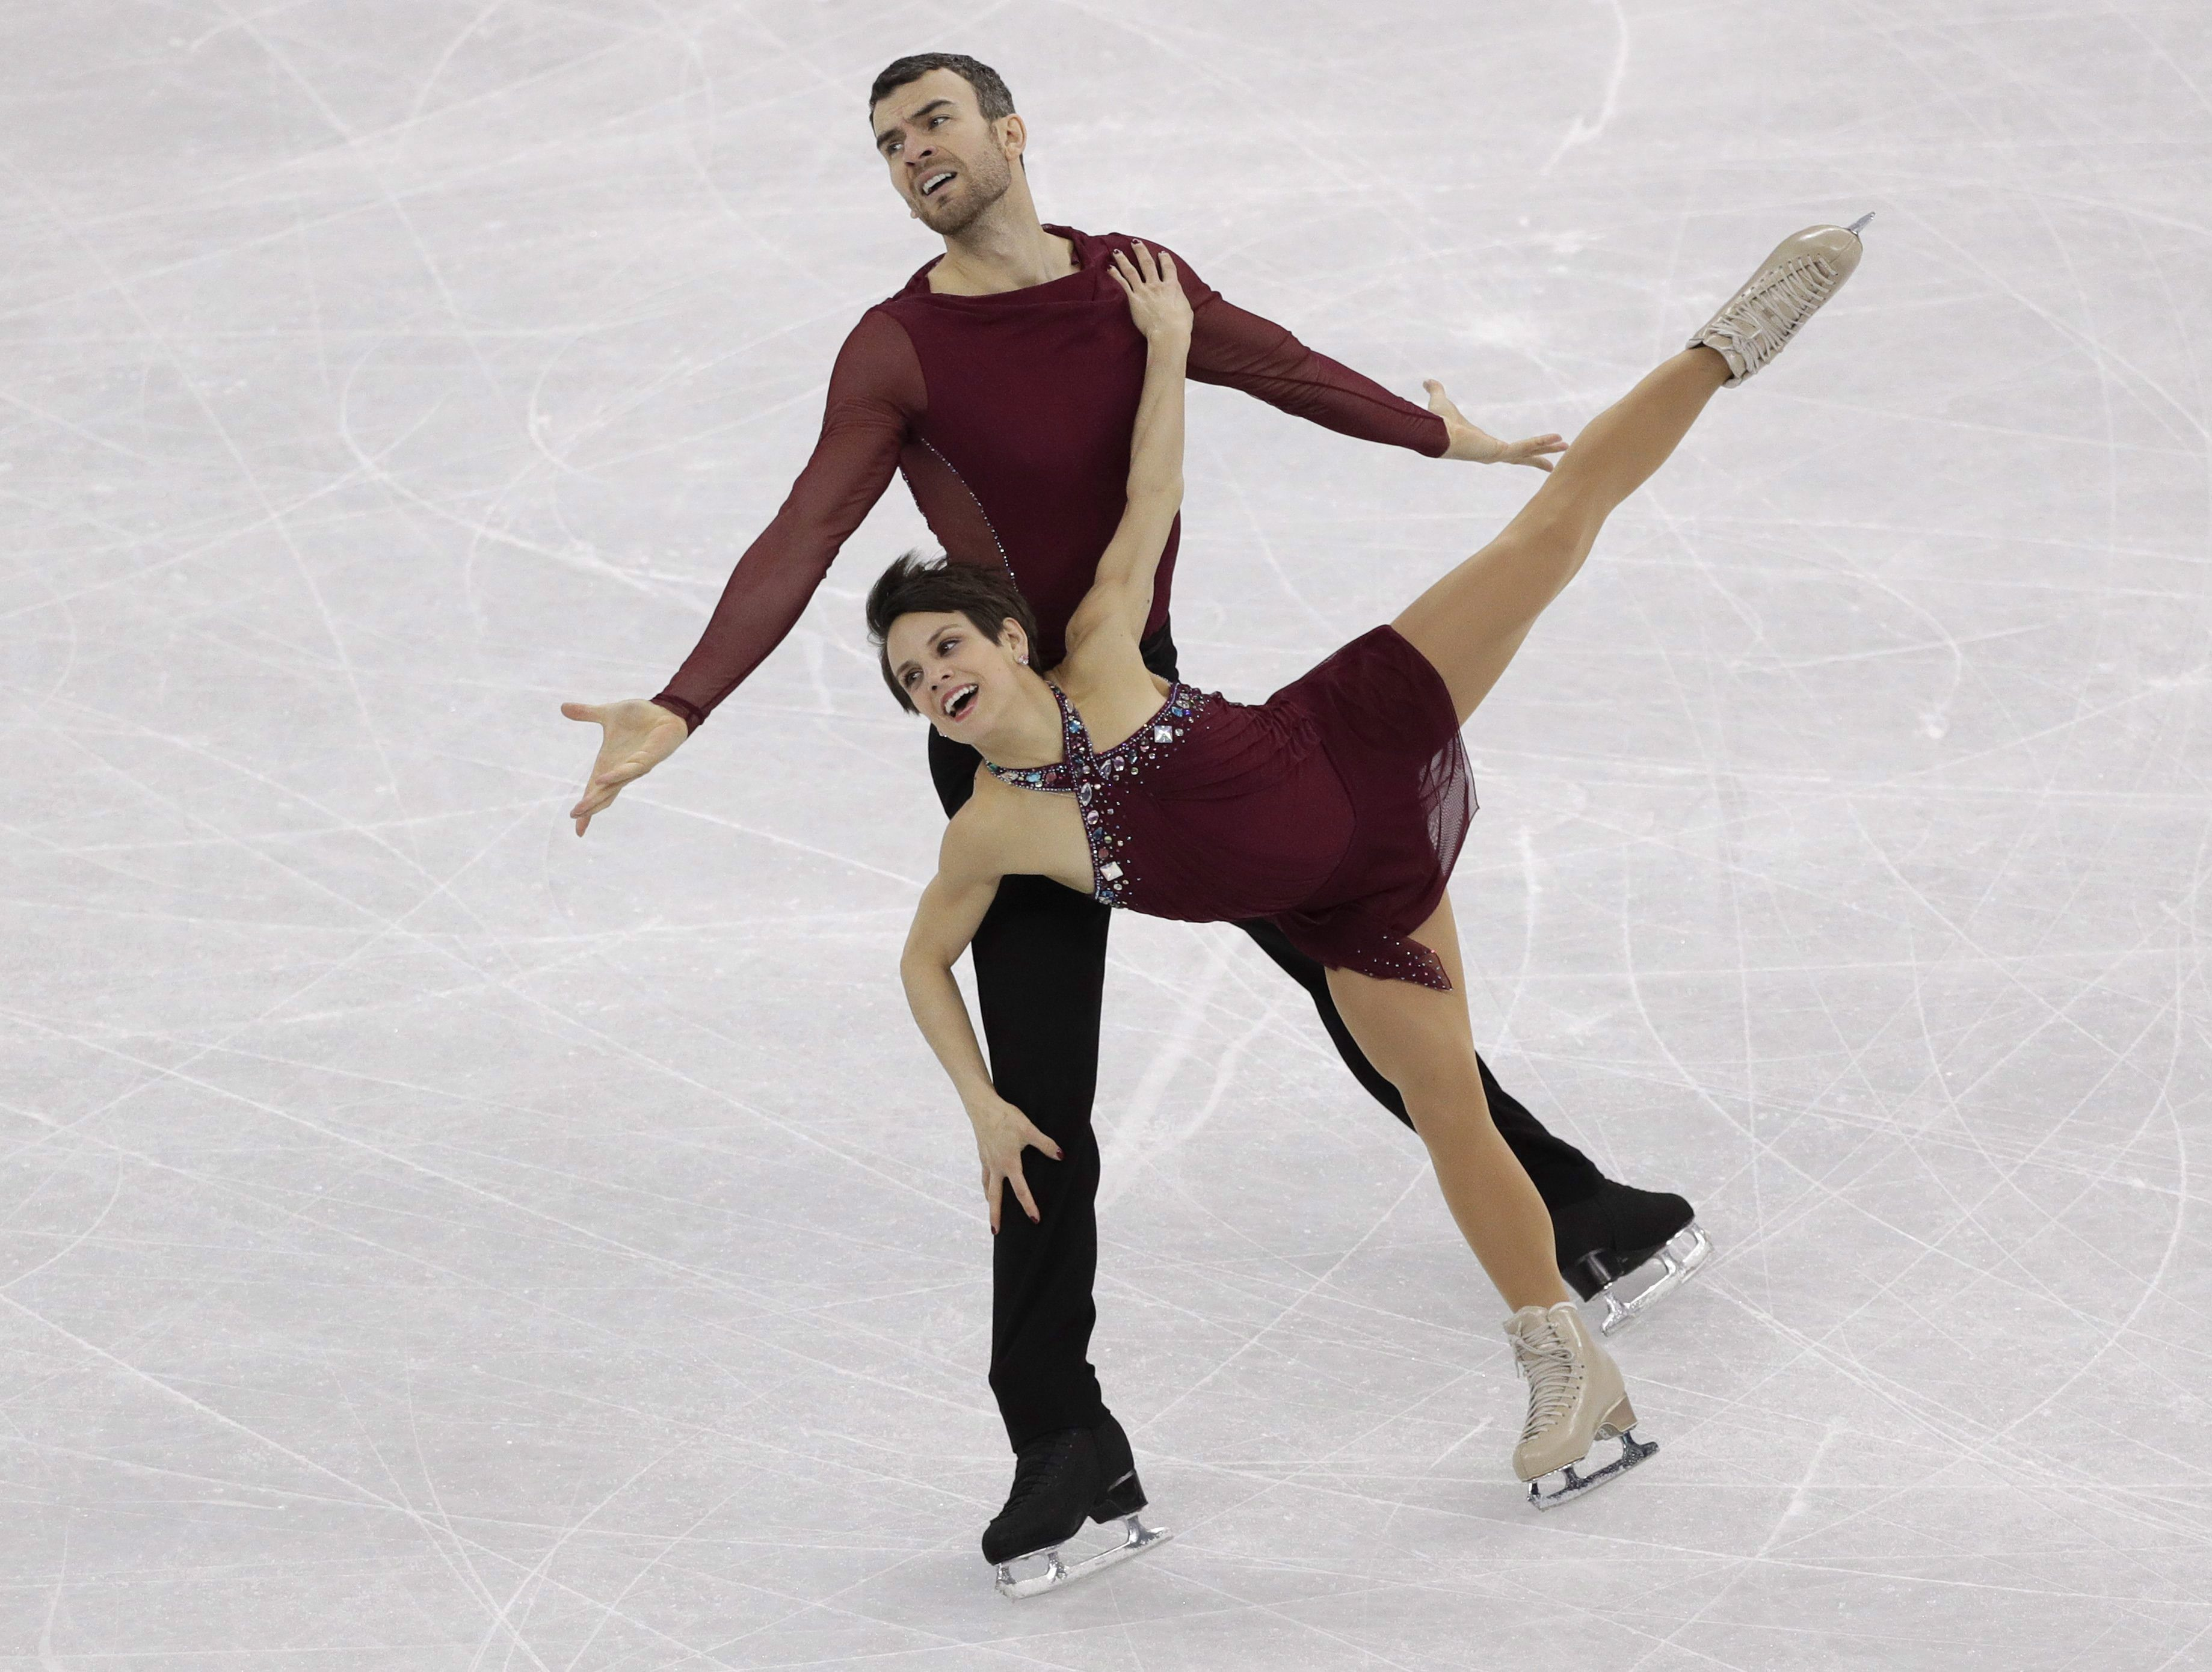 Meagan Duhamel and Eric Radford performing at 2018 Winter Olympics.